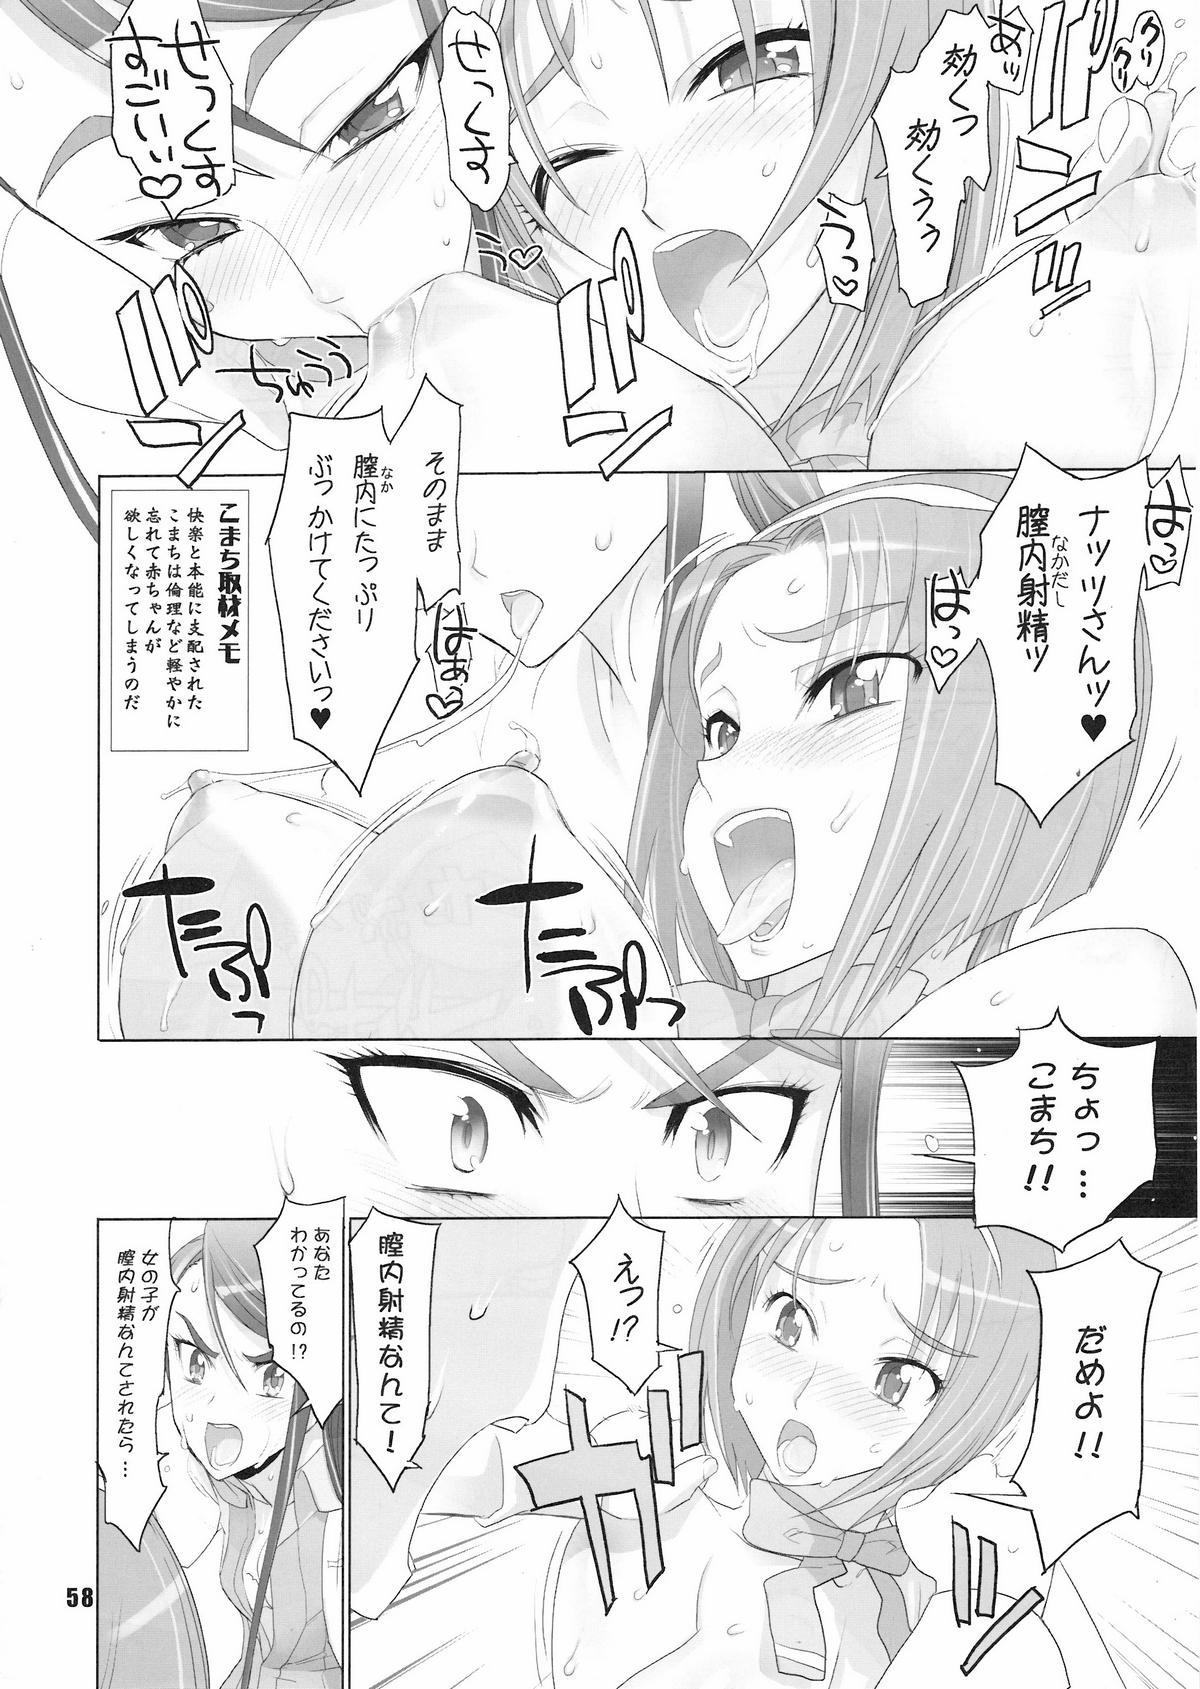 Inazuma Pretty Warrior 55